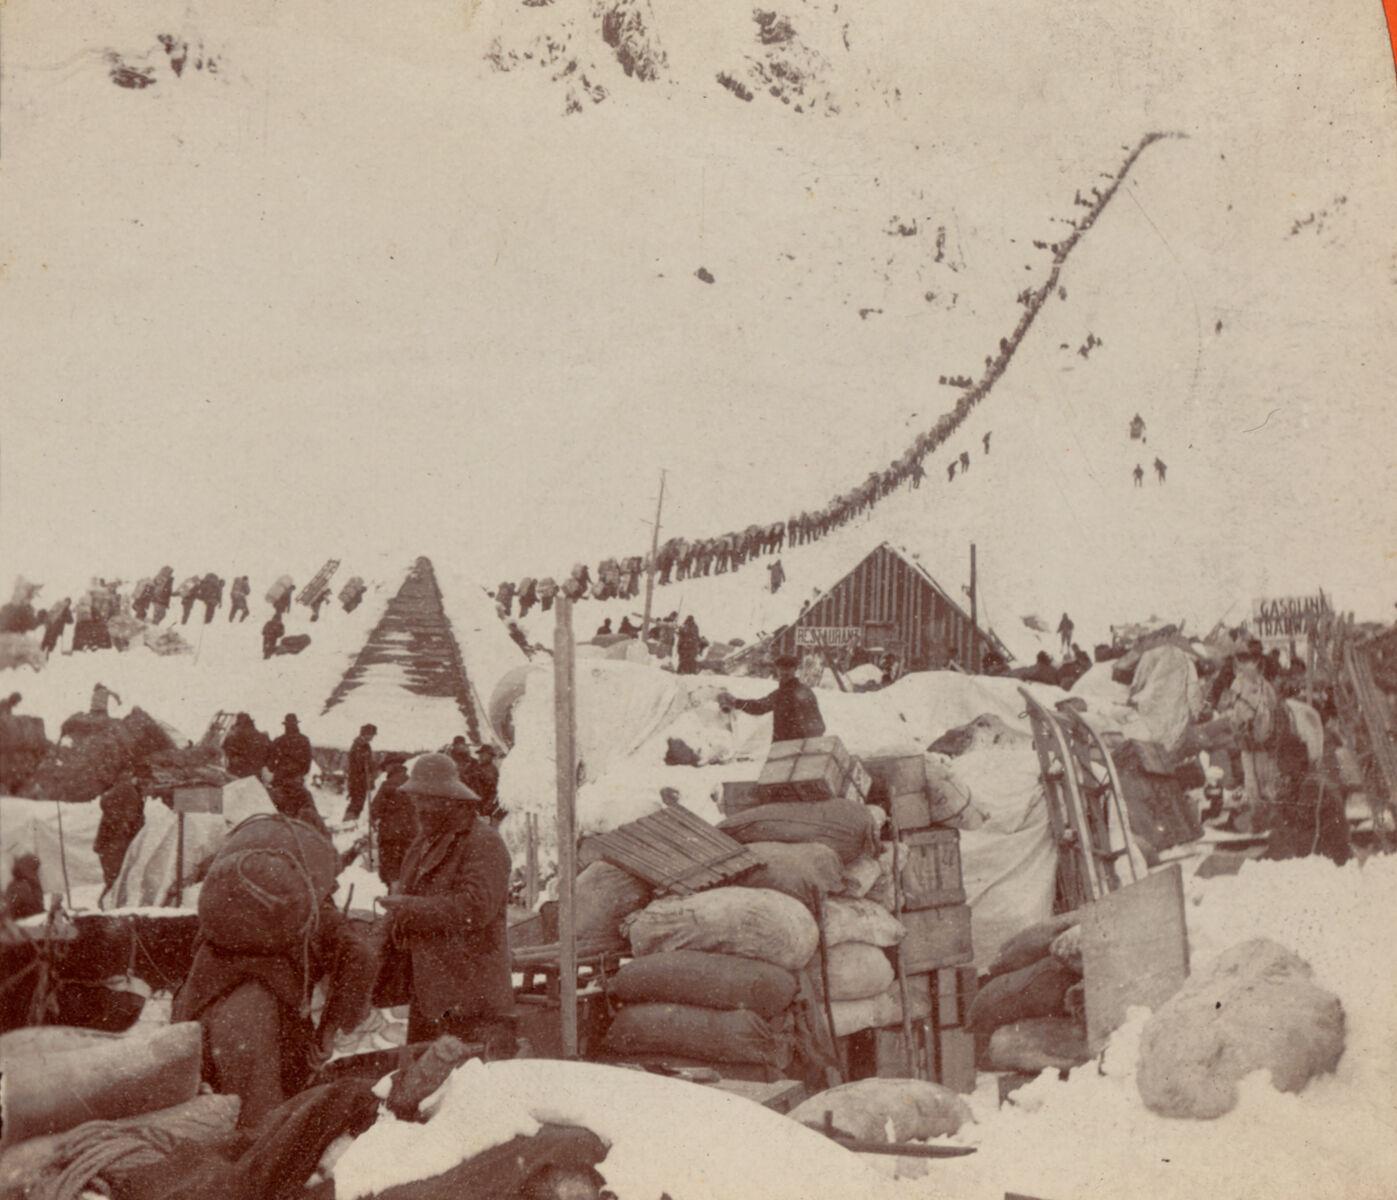 Prospectors bound for the Klondike gold fields, in Chilkoot Pass, Alaska, 1898. Digital Commonwealth.